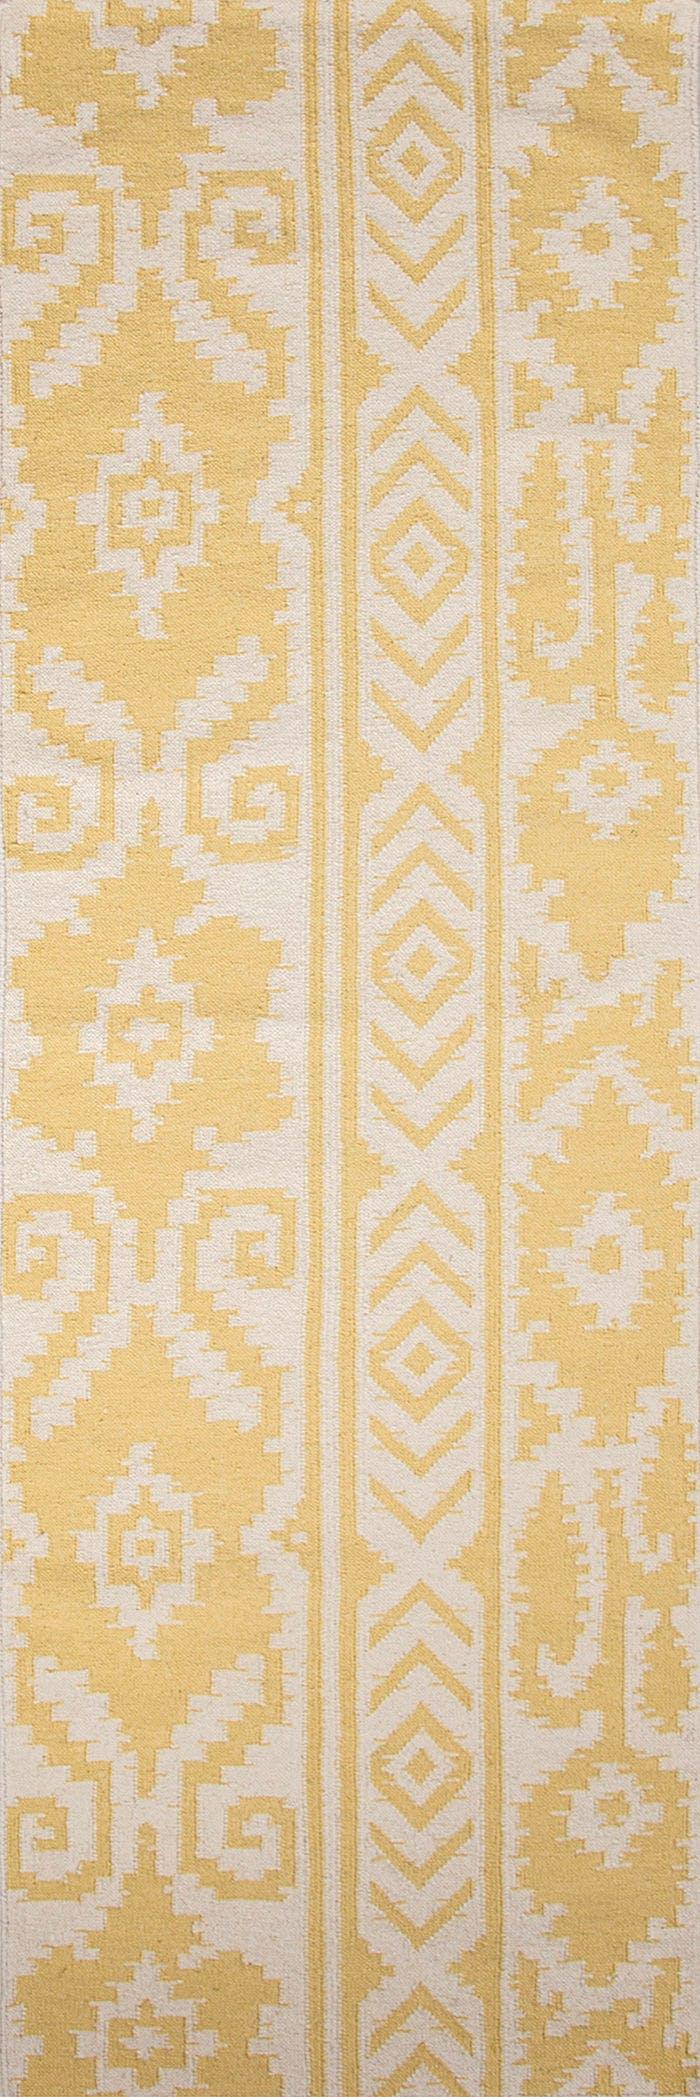 Picture of: Jaipur Rugs Floor Coverings Flat Weave Tribal Pattern Wool Yellow Ivory Area Rug 8×10